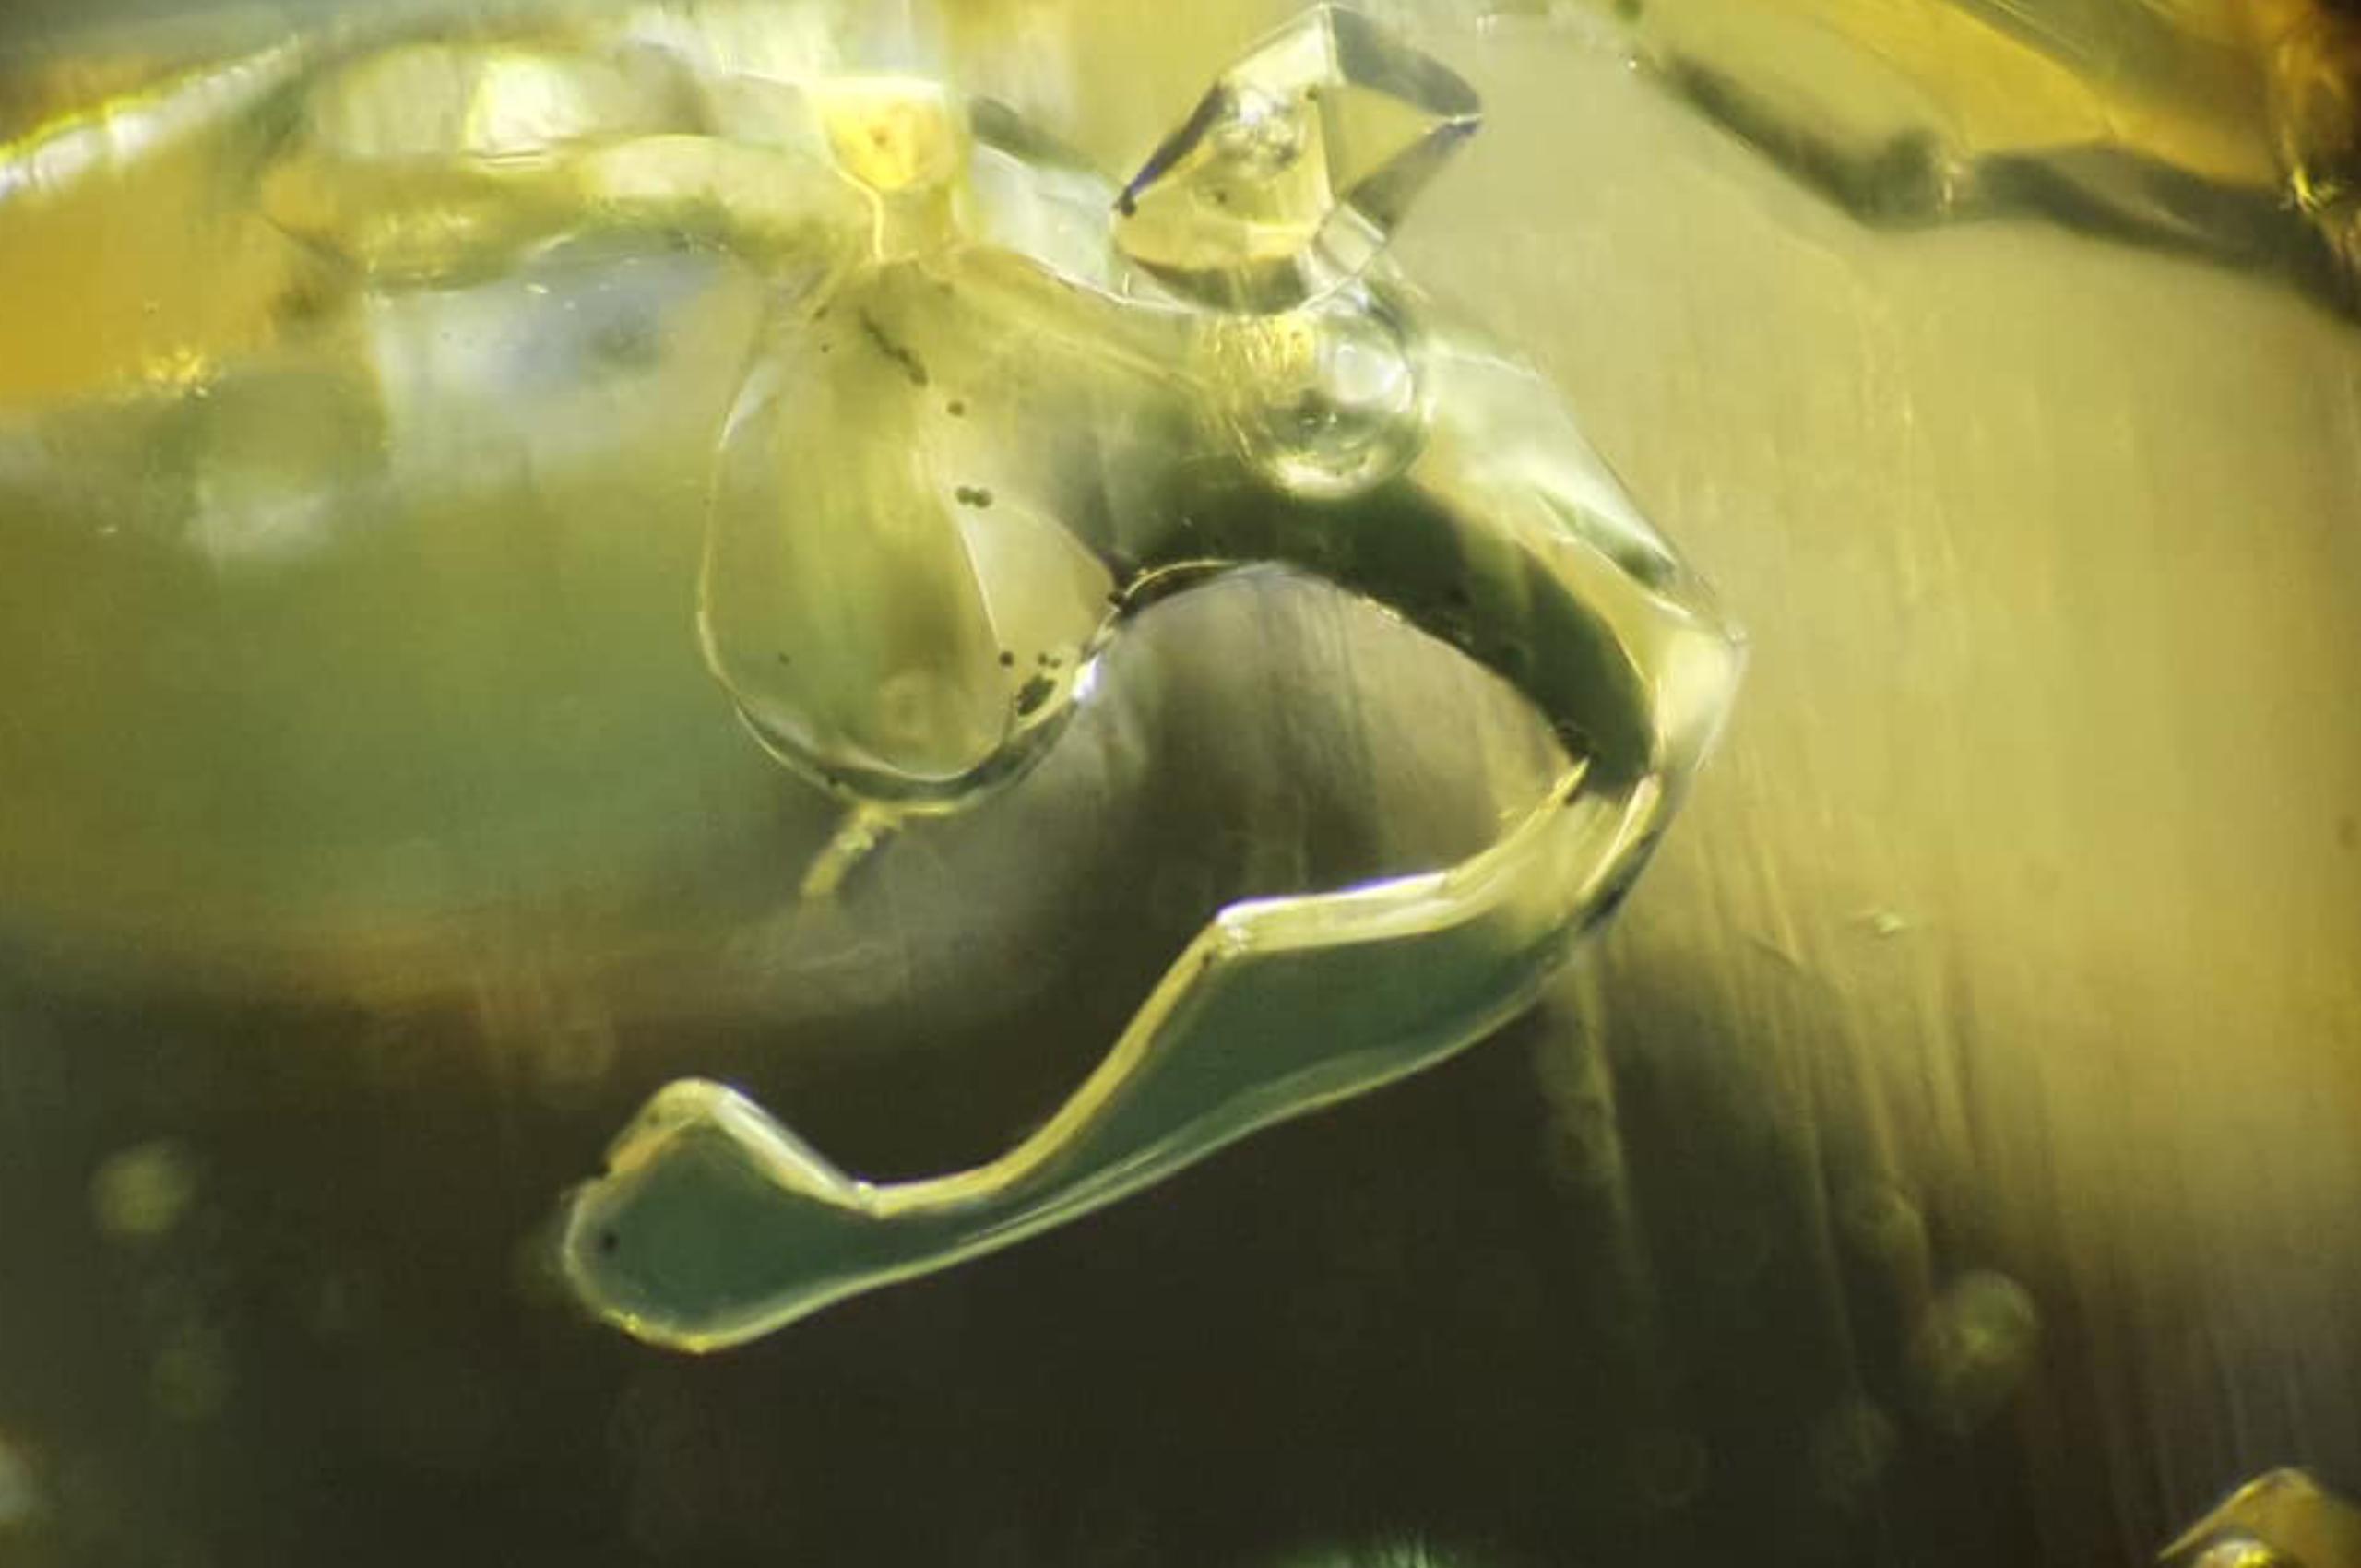 Petroleum, bitumen, Methane and negative crystal in Petroluem quartz. Photo by Gérald Deplus